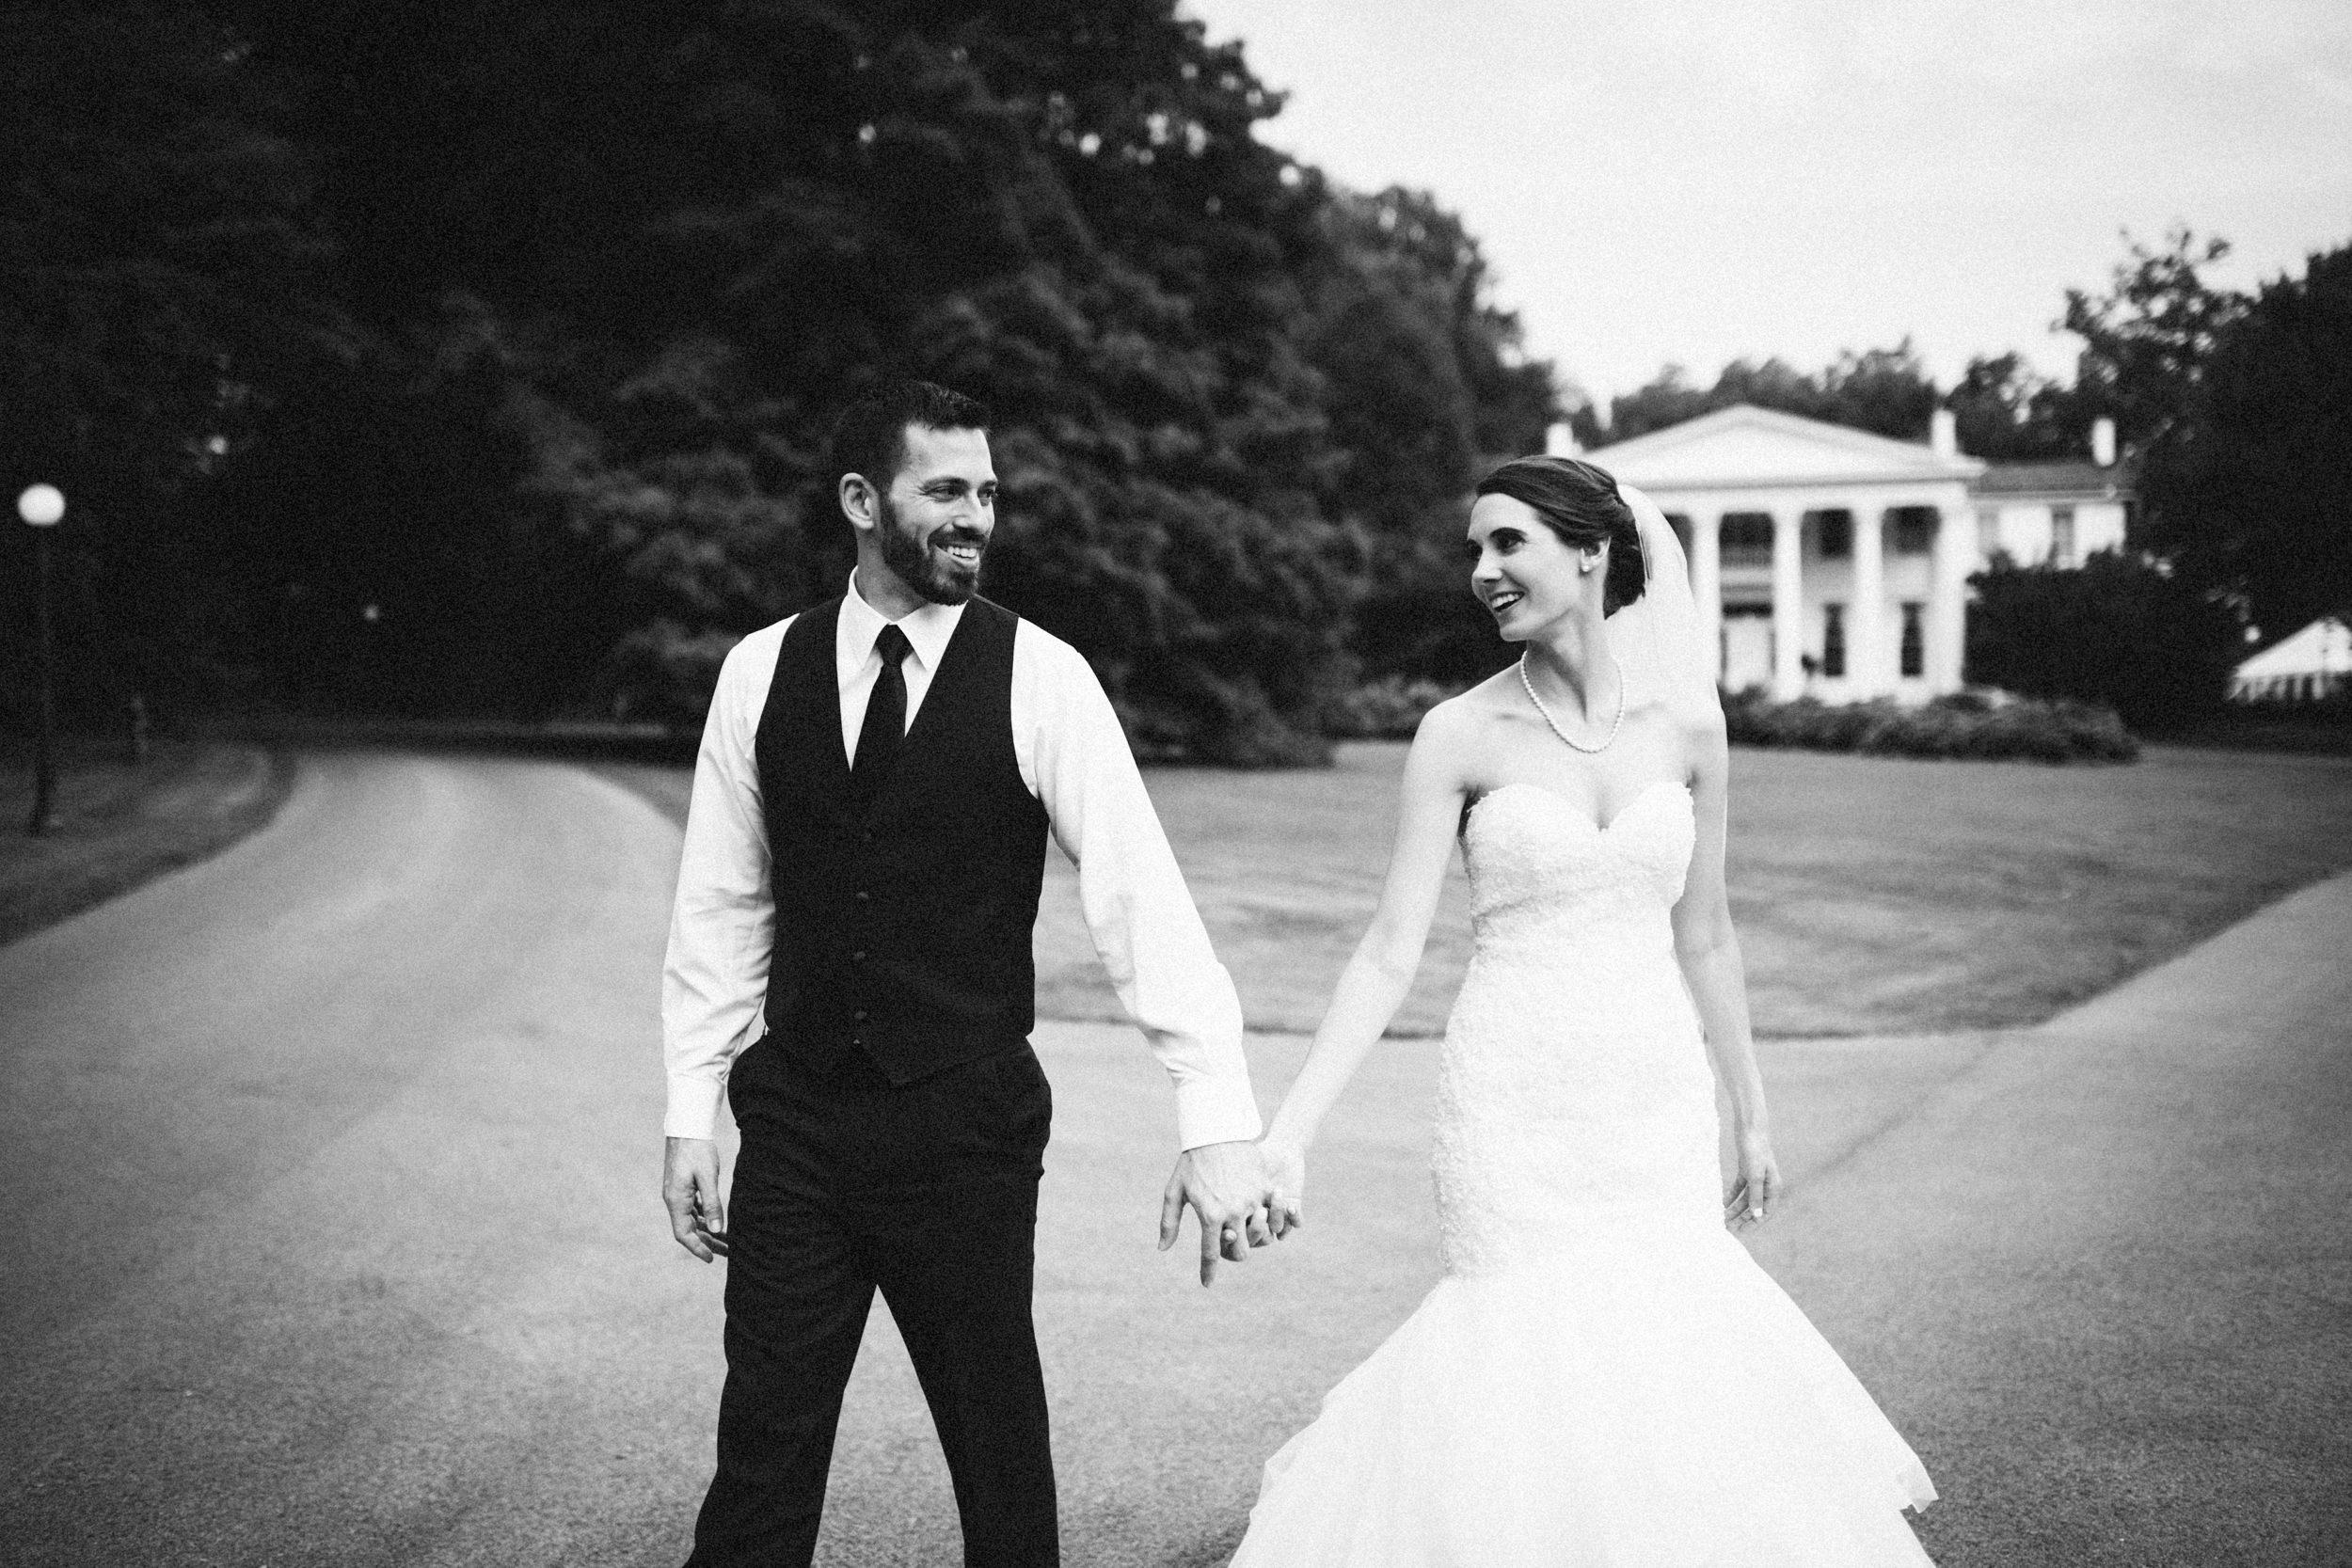 Louisville-Kentucky-Wedding-Elopement-Photographer-Sarah-Katherine-Davis-Photography-Whitehall-Classic-Timeless-Garden-Wedding-557.jpg